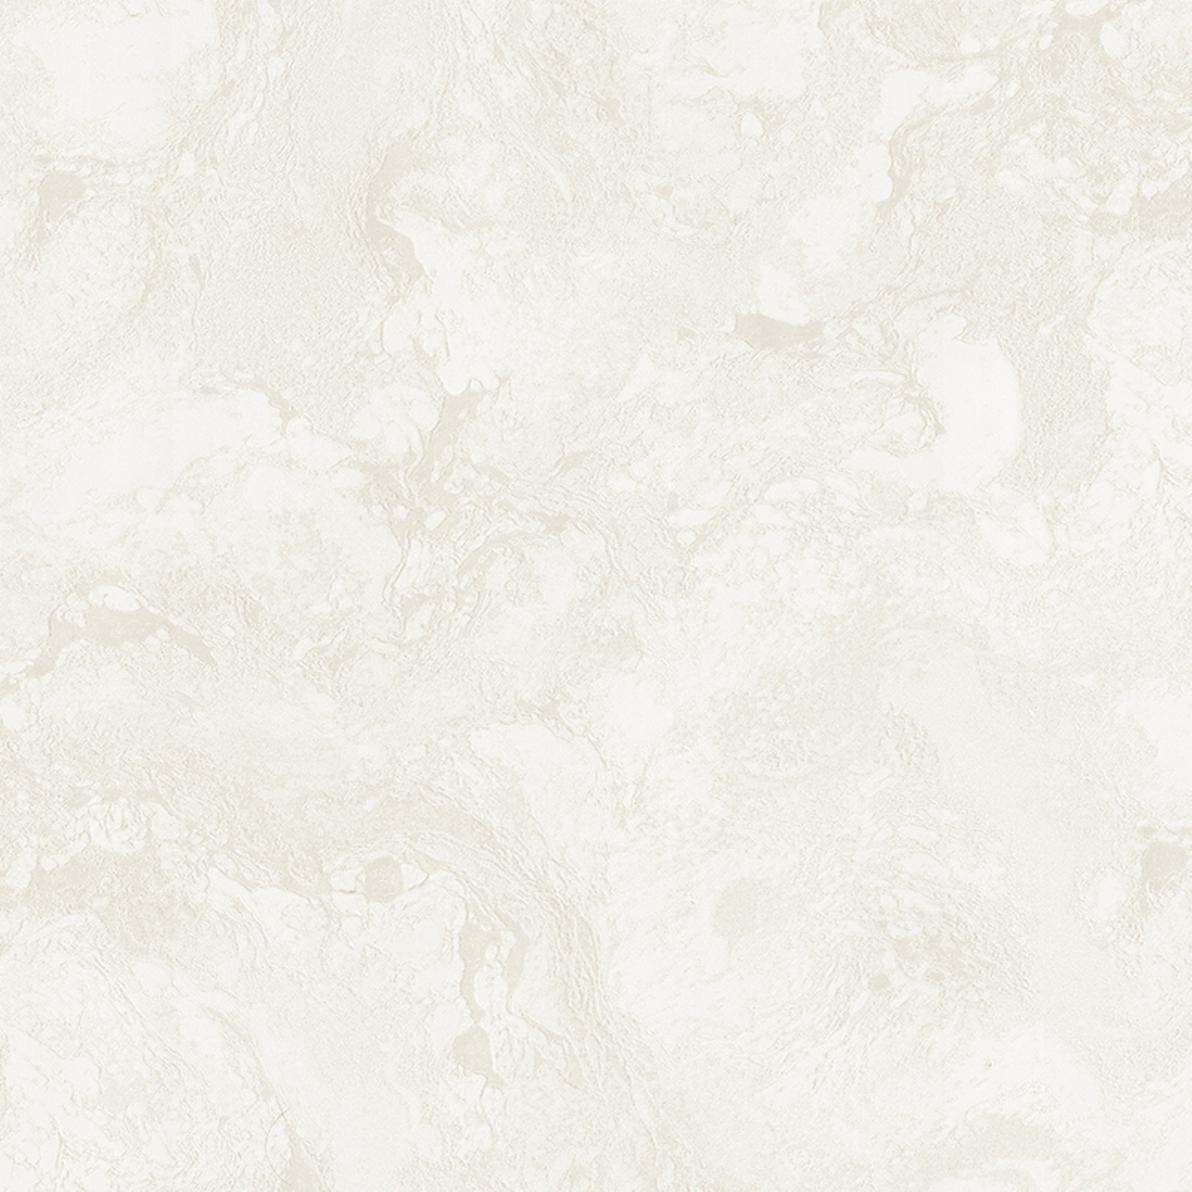 Обои Decori & Decori Carrara 82666